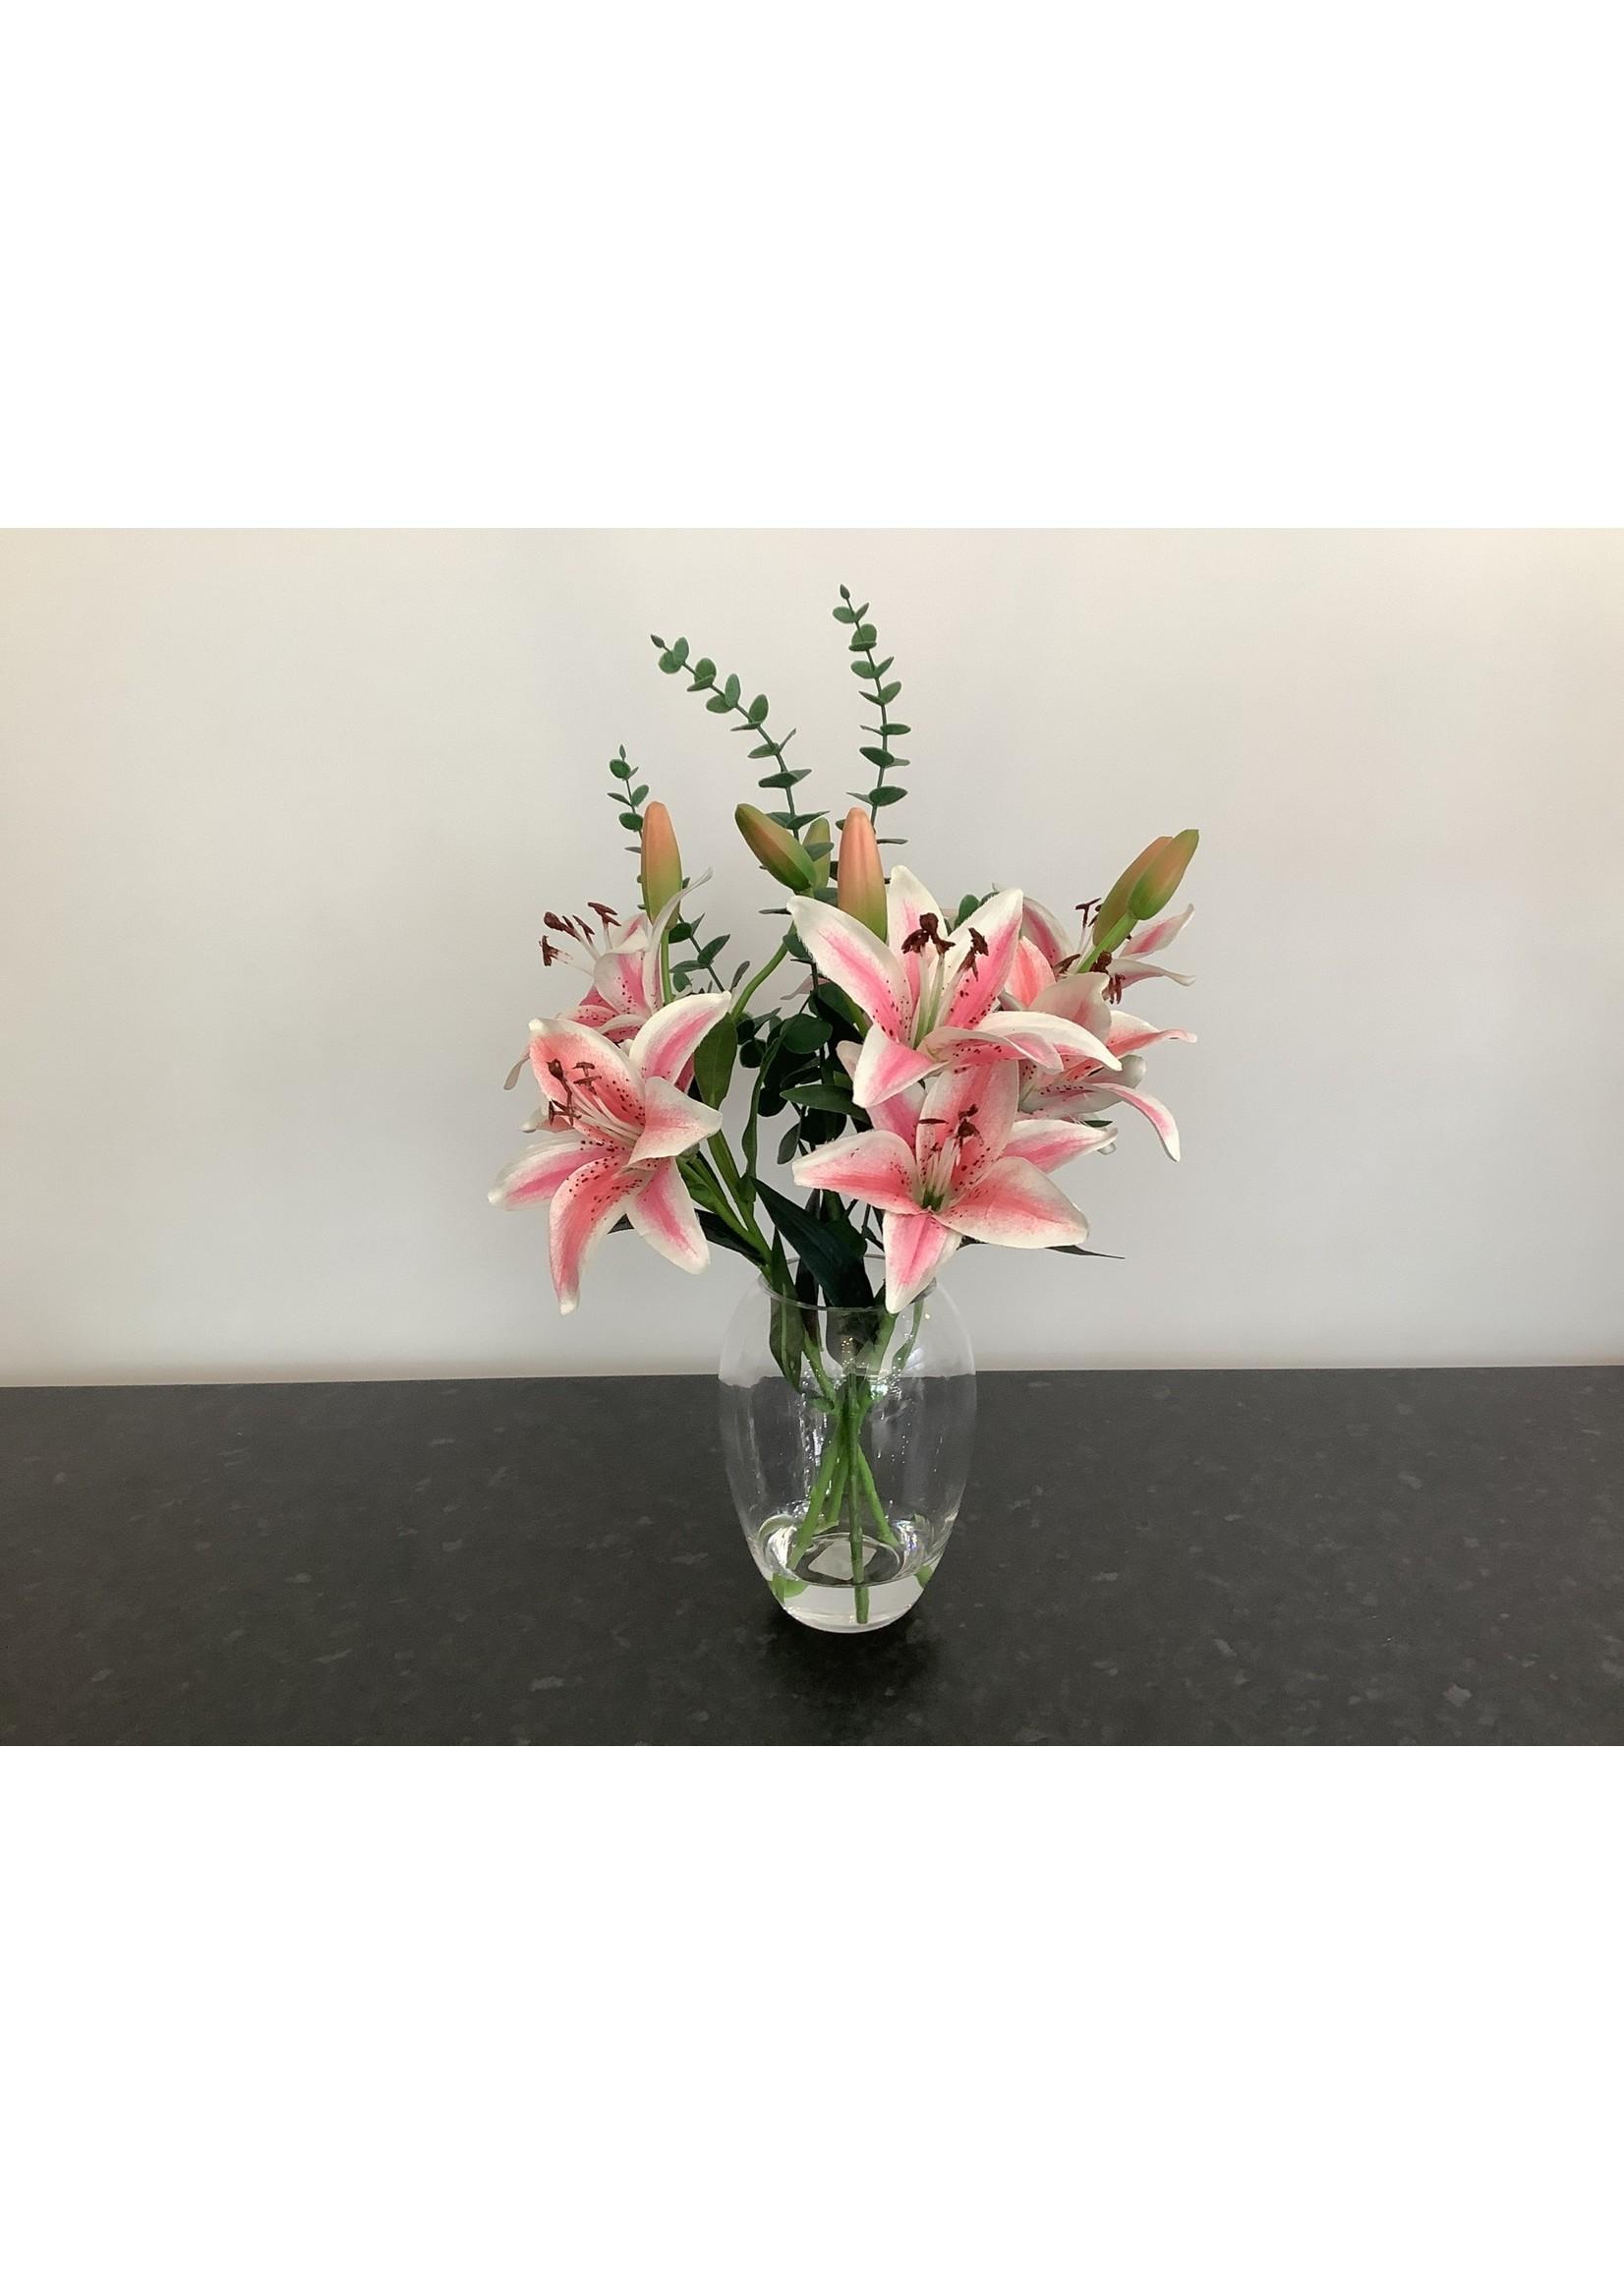 Lily & Eucalyptus in Vase